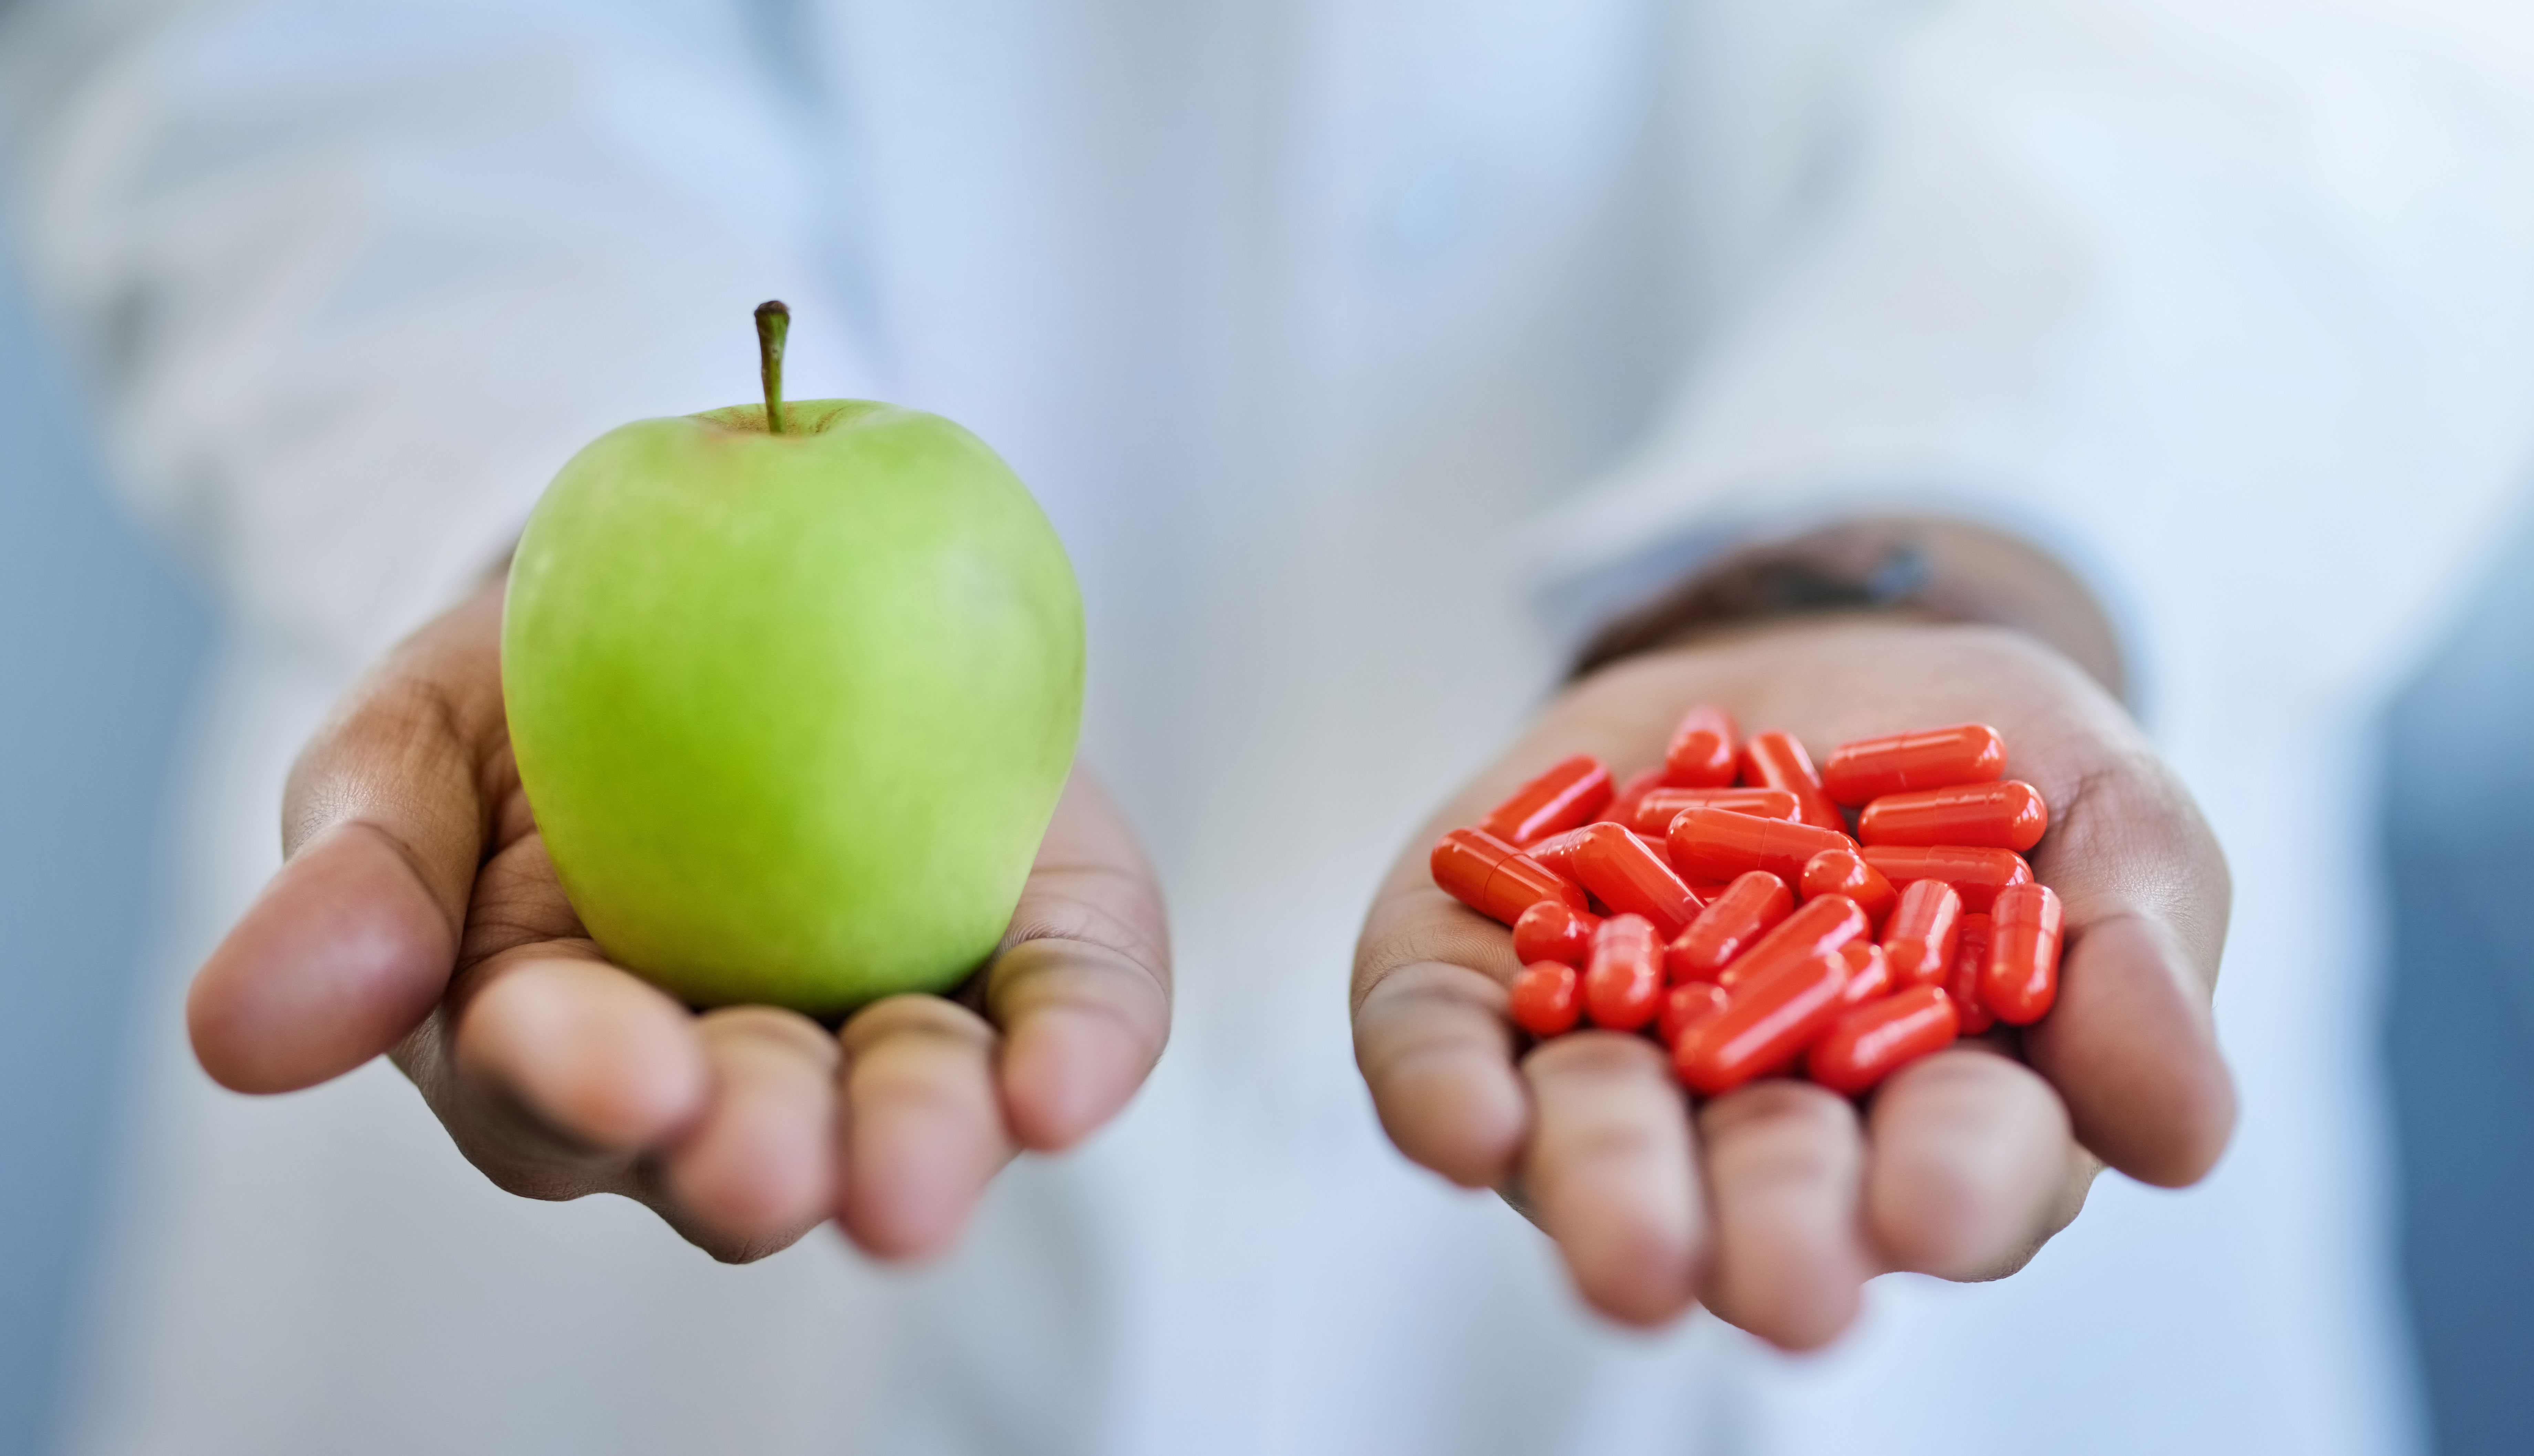 Manzana versus pastillas